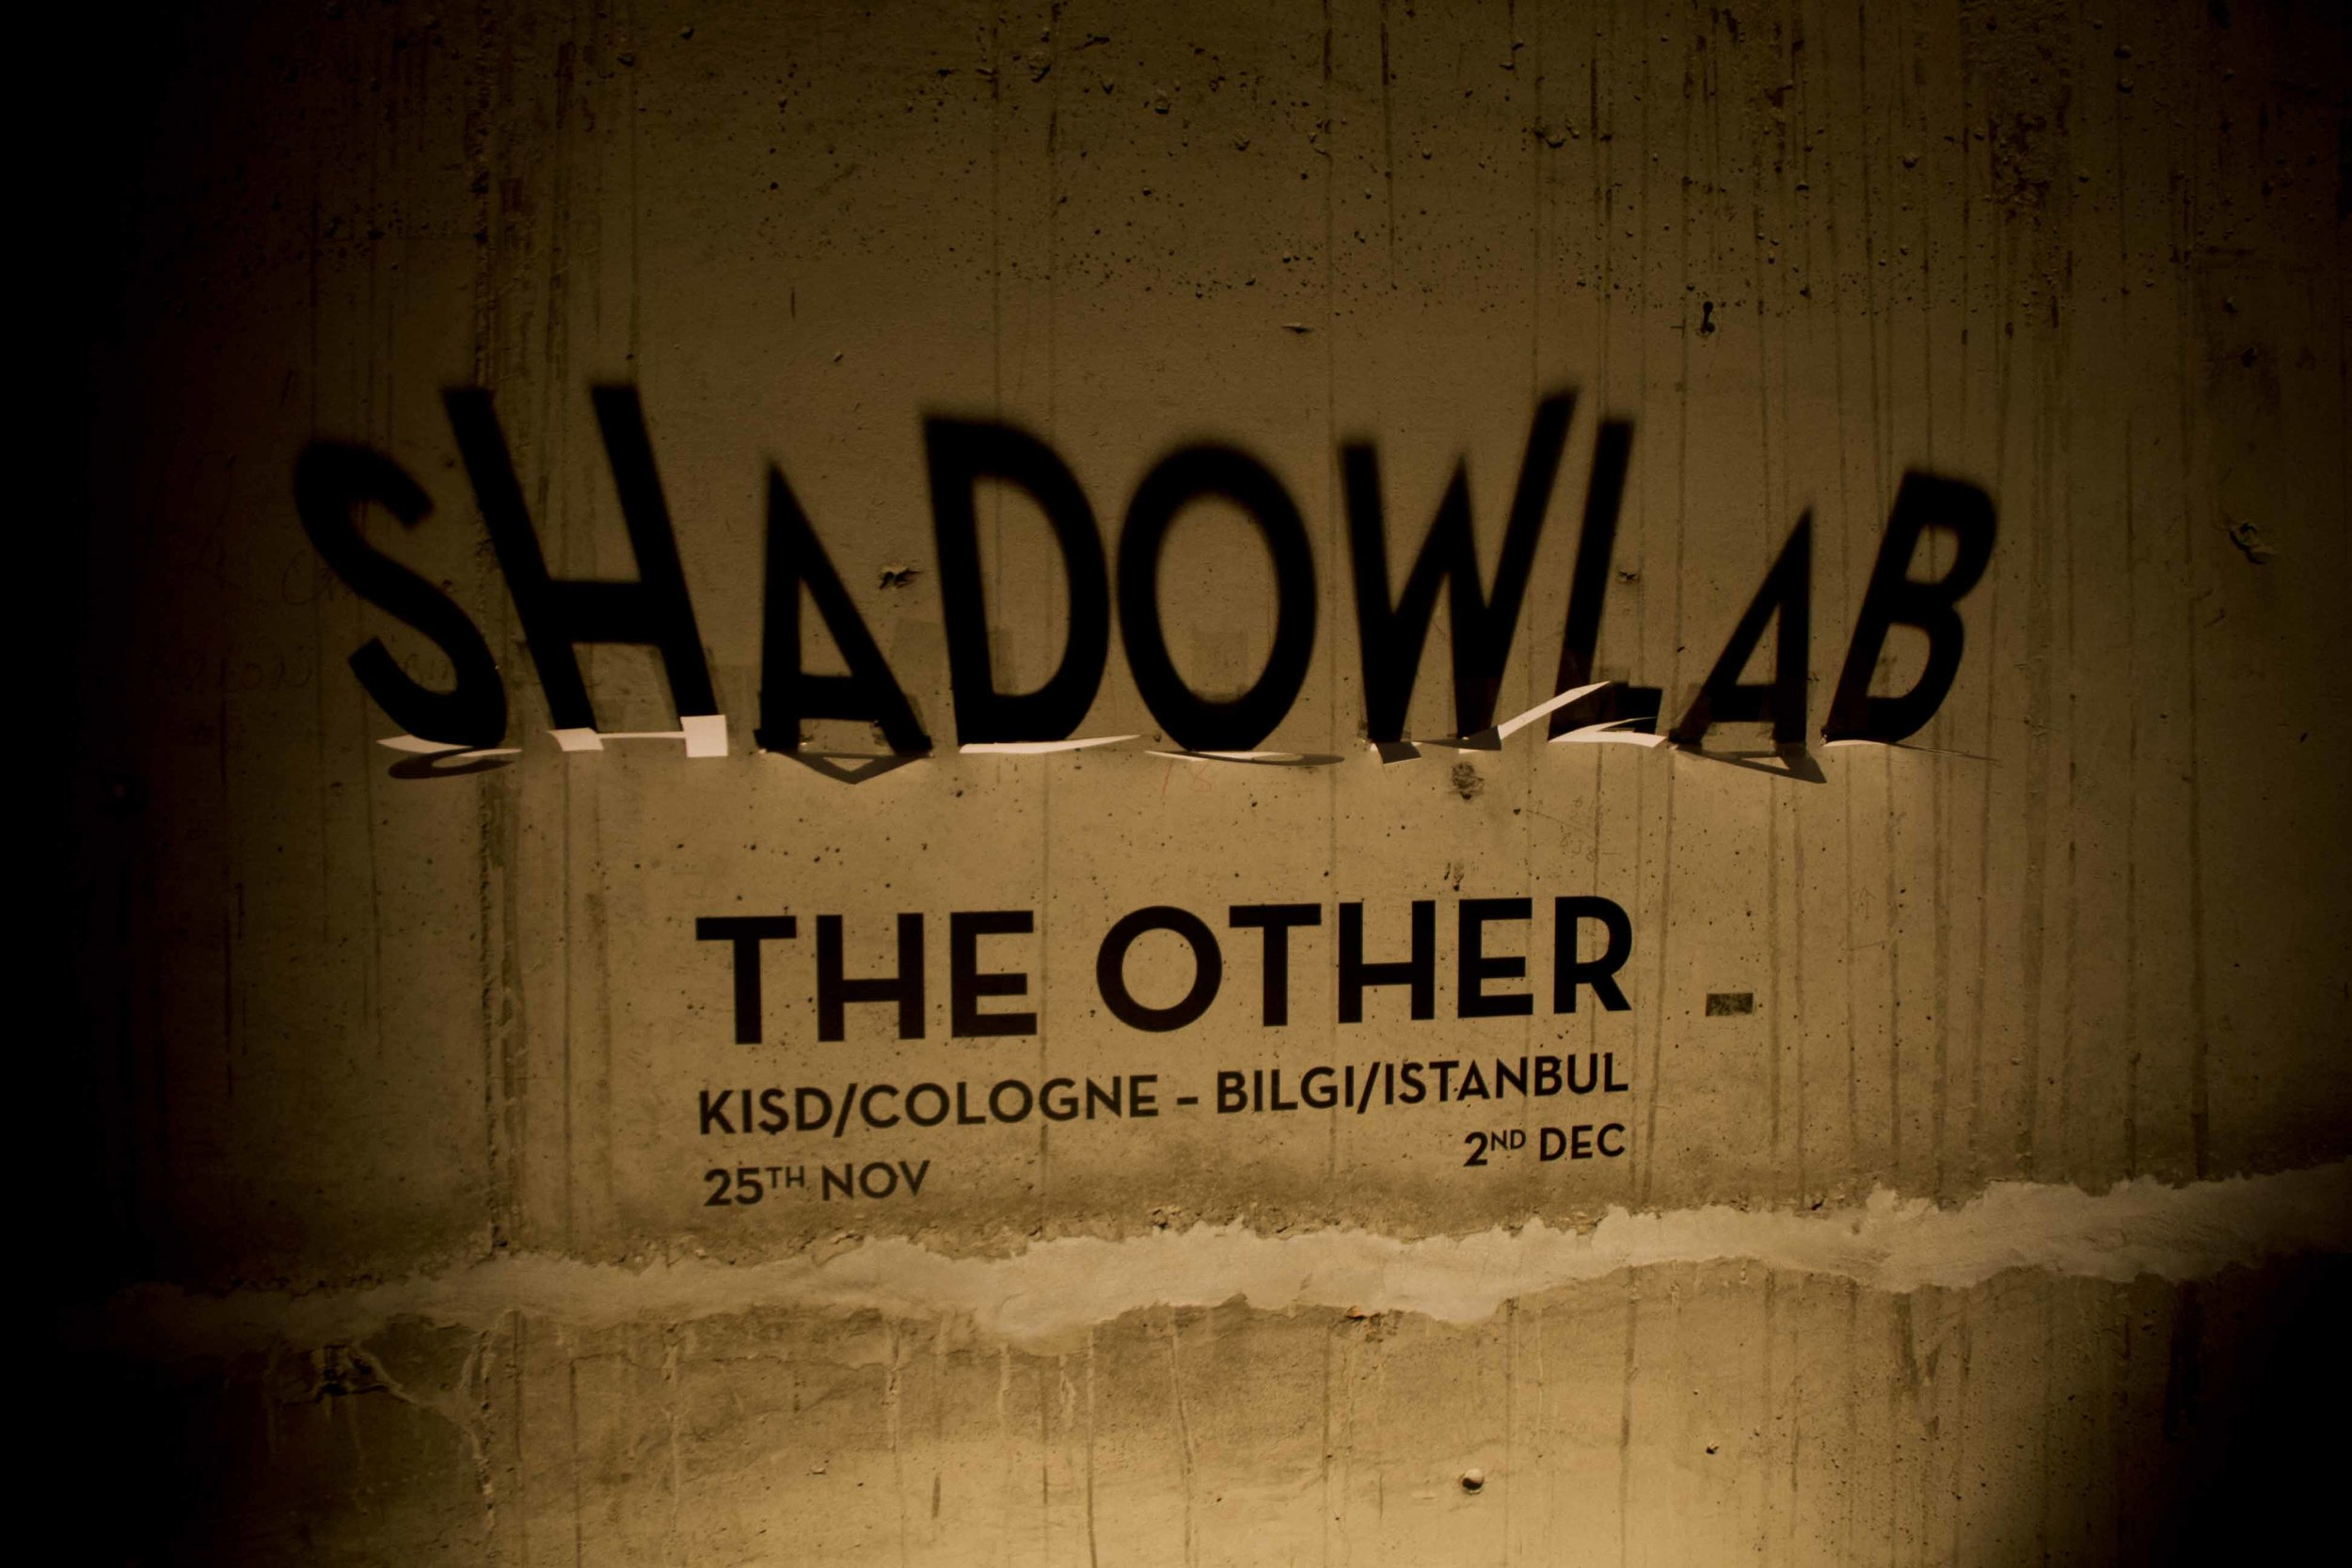 shadowlab_5.jpg